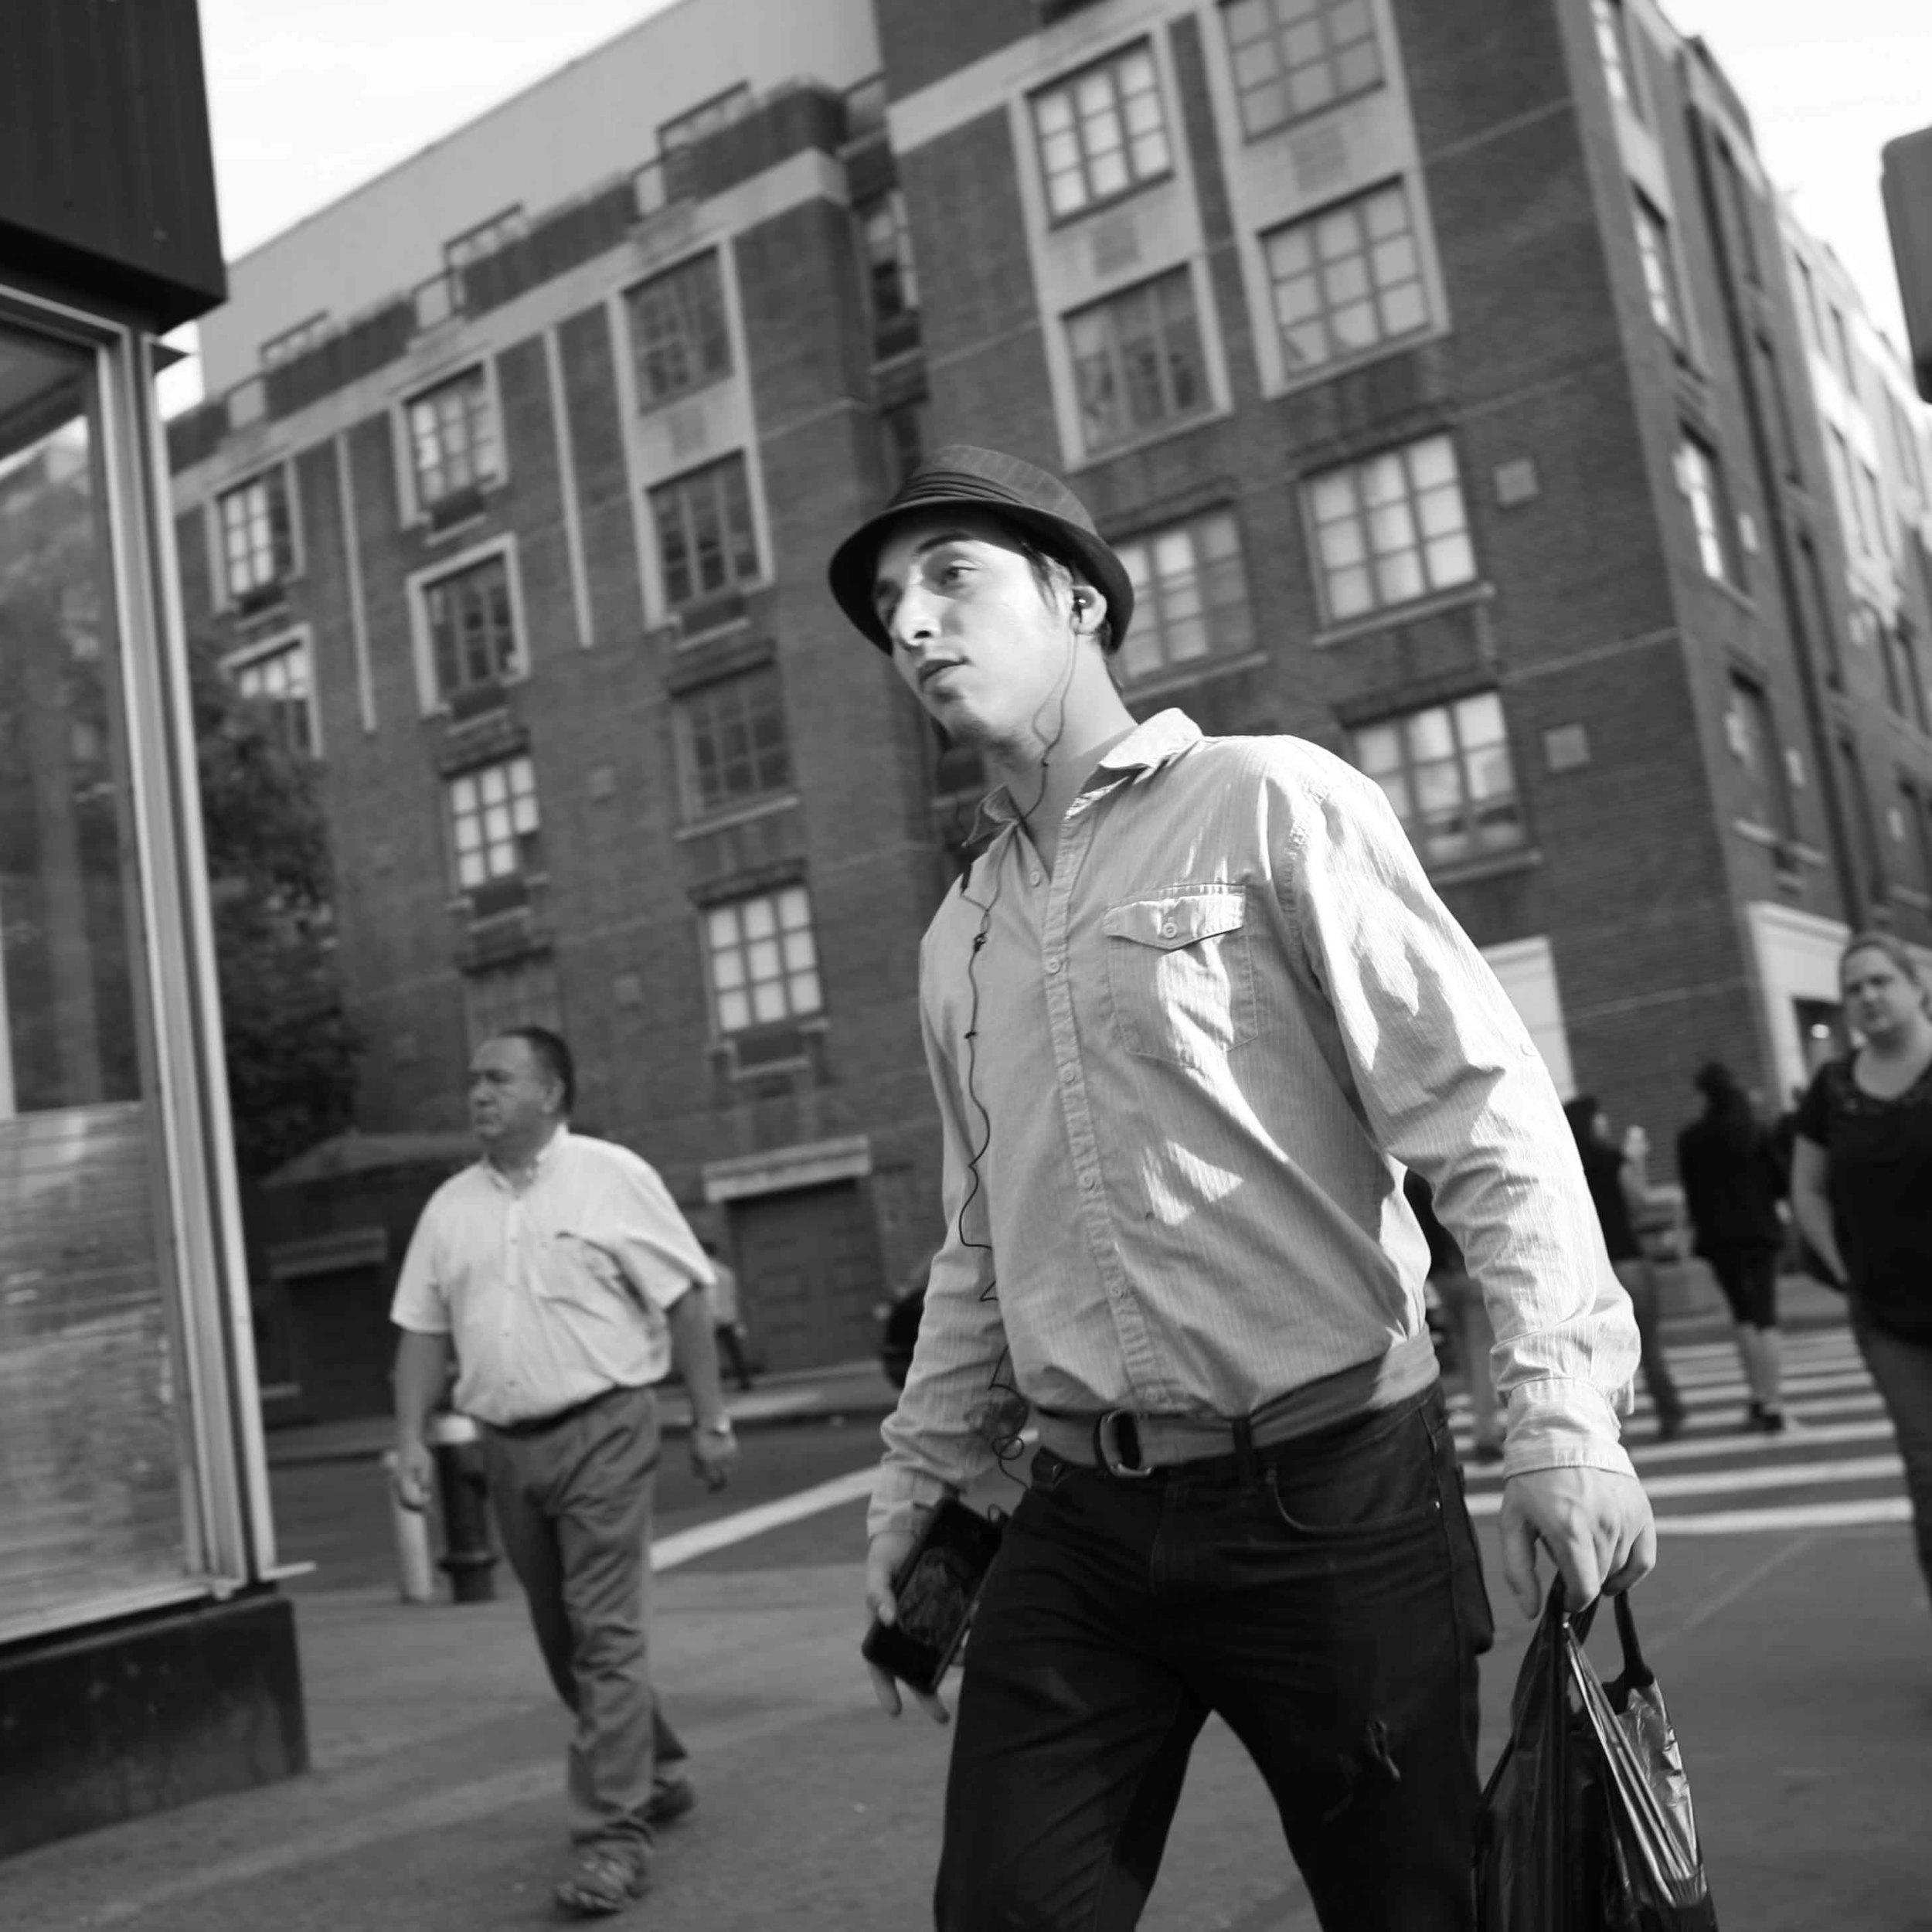 Streetphotography 3.0-122.jpg